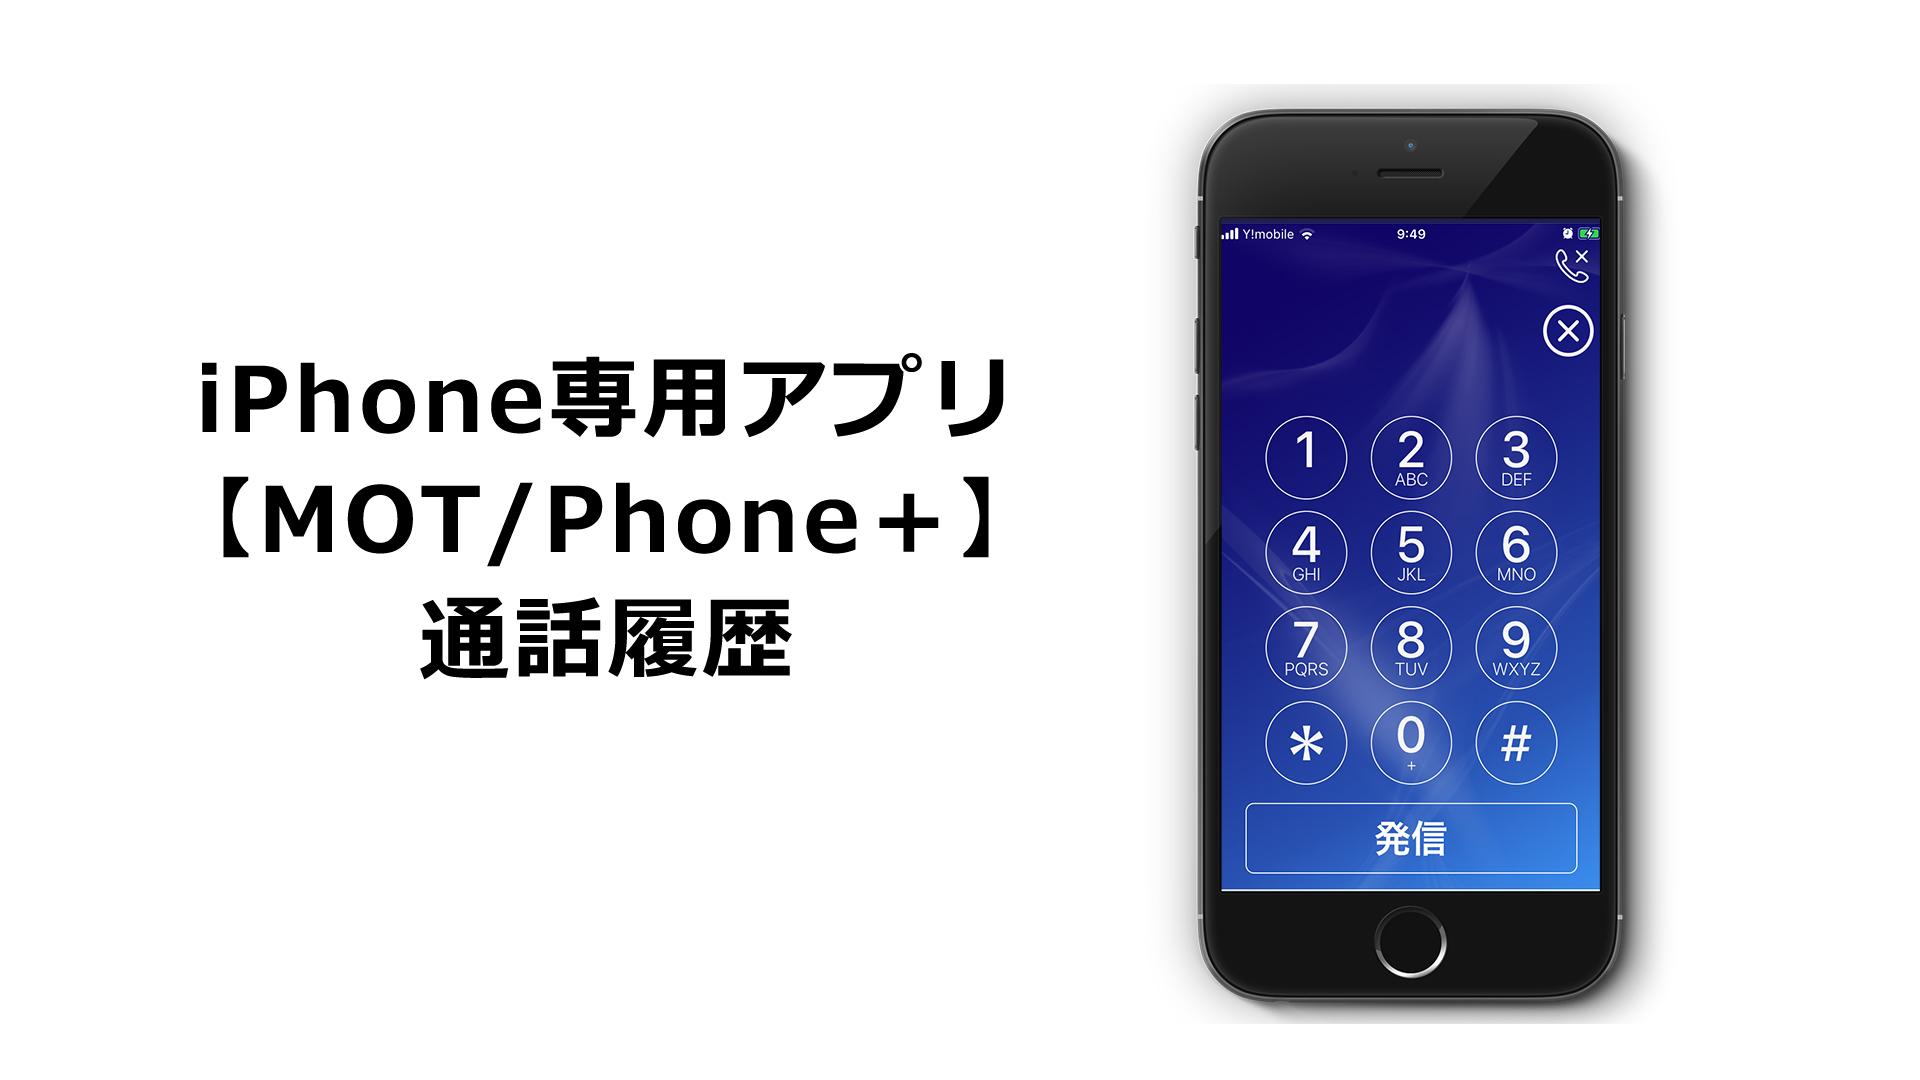 【MOTPhone+】t通話履歴